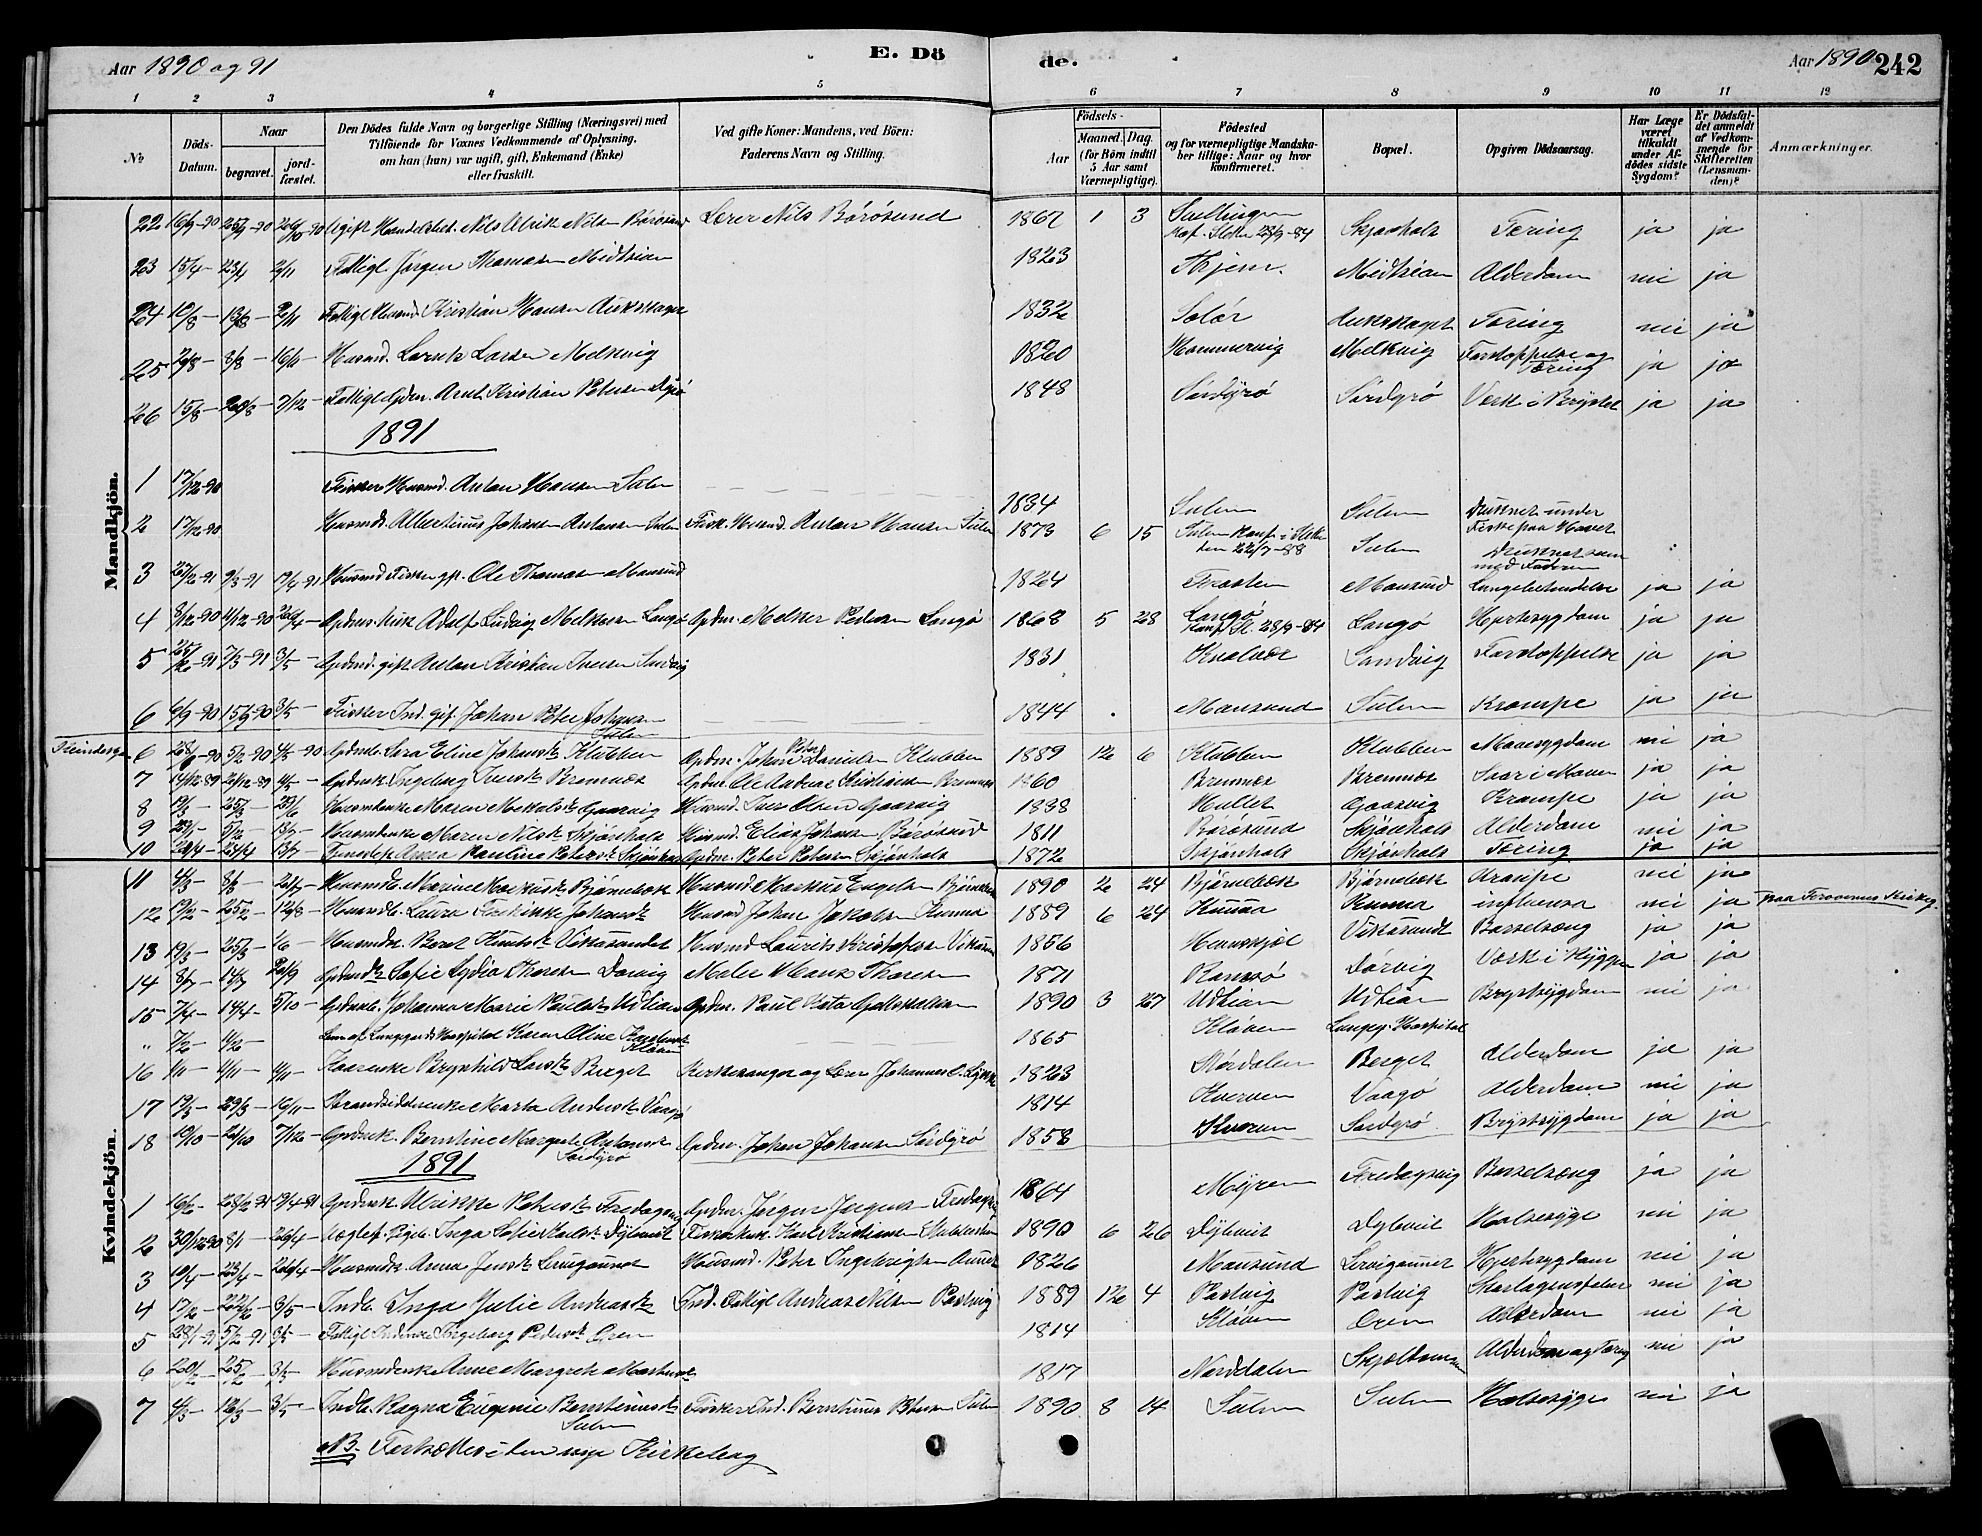 SAT, Ministerialprotokoller, klokkerbøker og fødselsregistre - Sør-Trøndelag, 640/L0585: Parish register (copy) no. 640C03, 1878-1891, p. 242